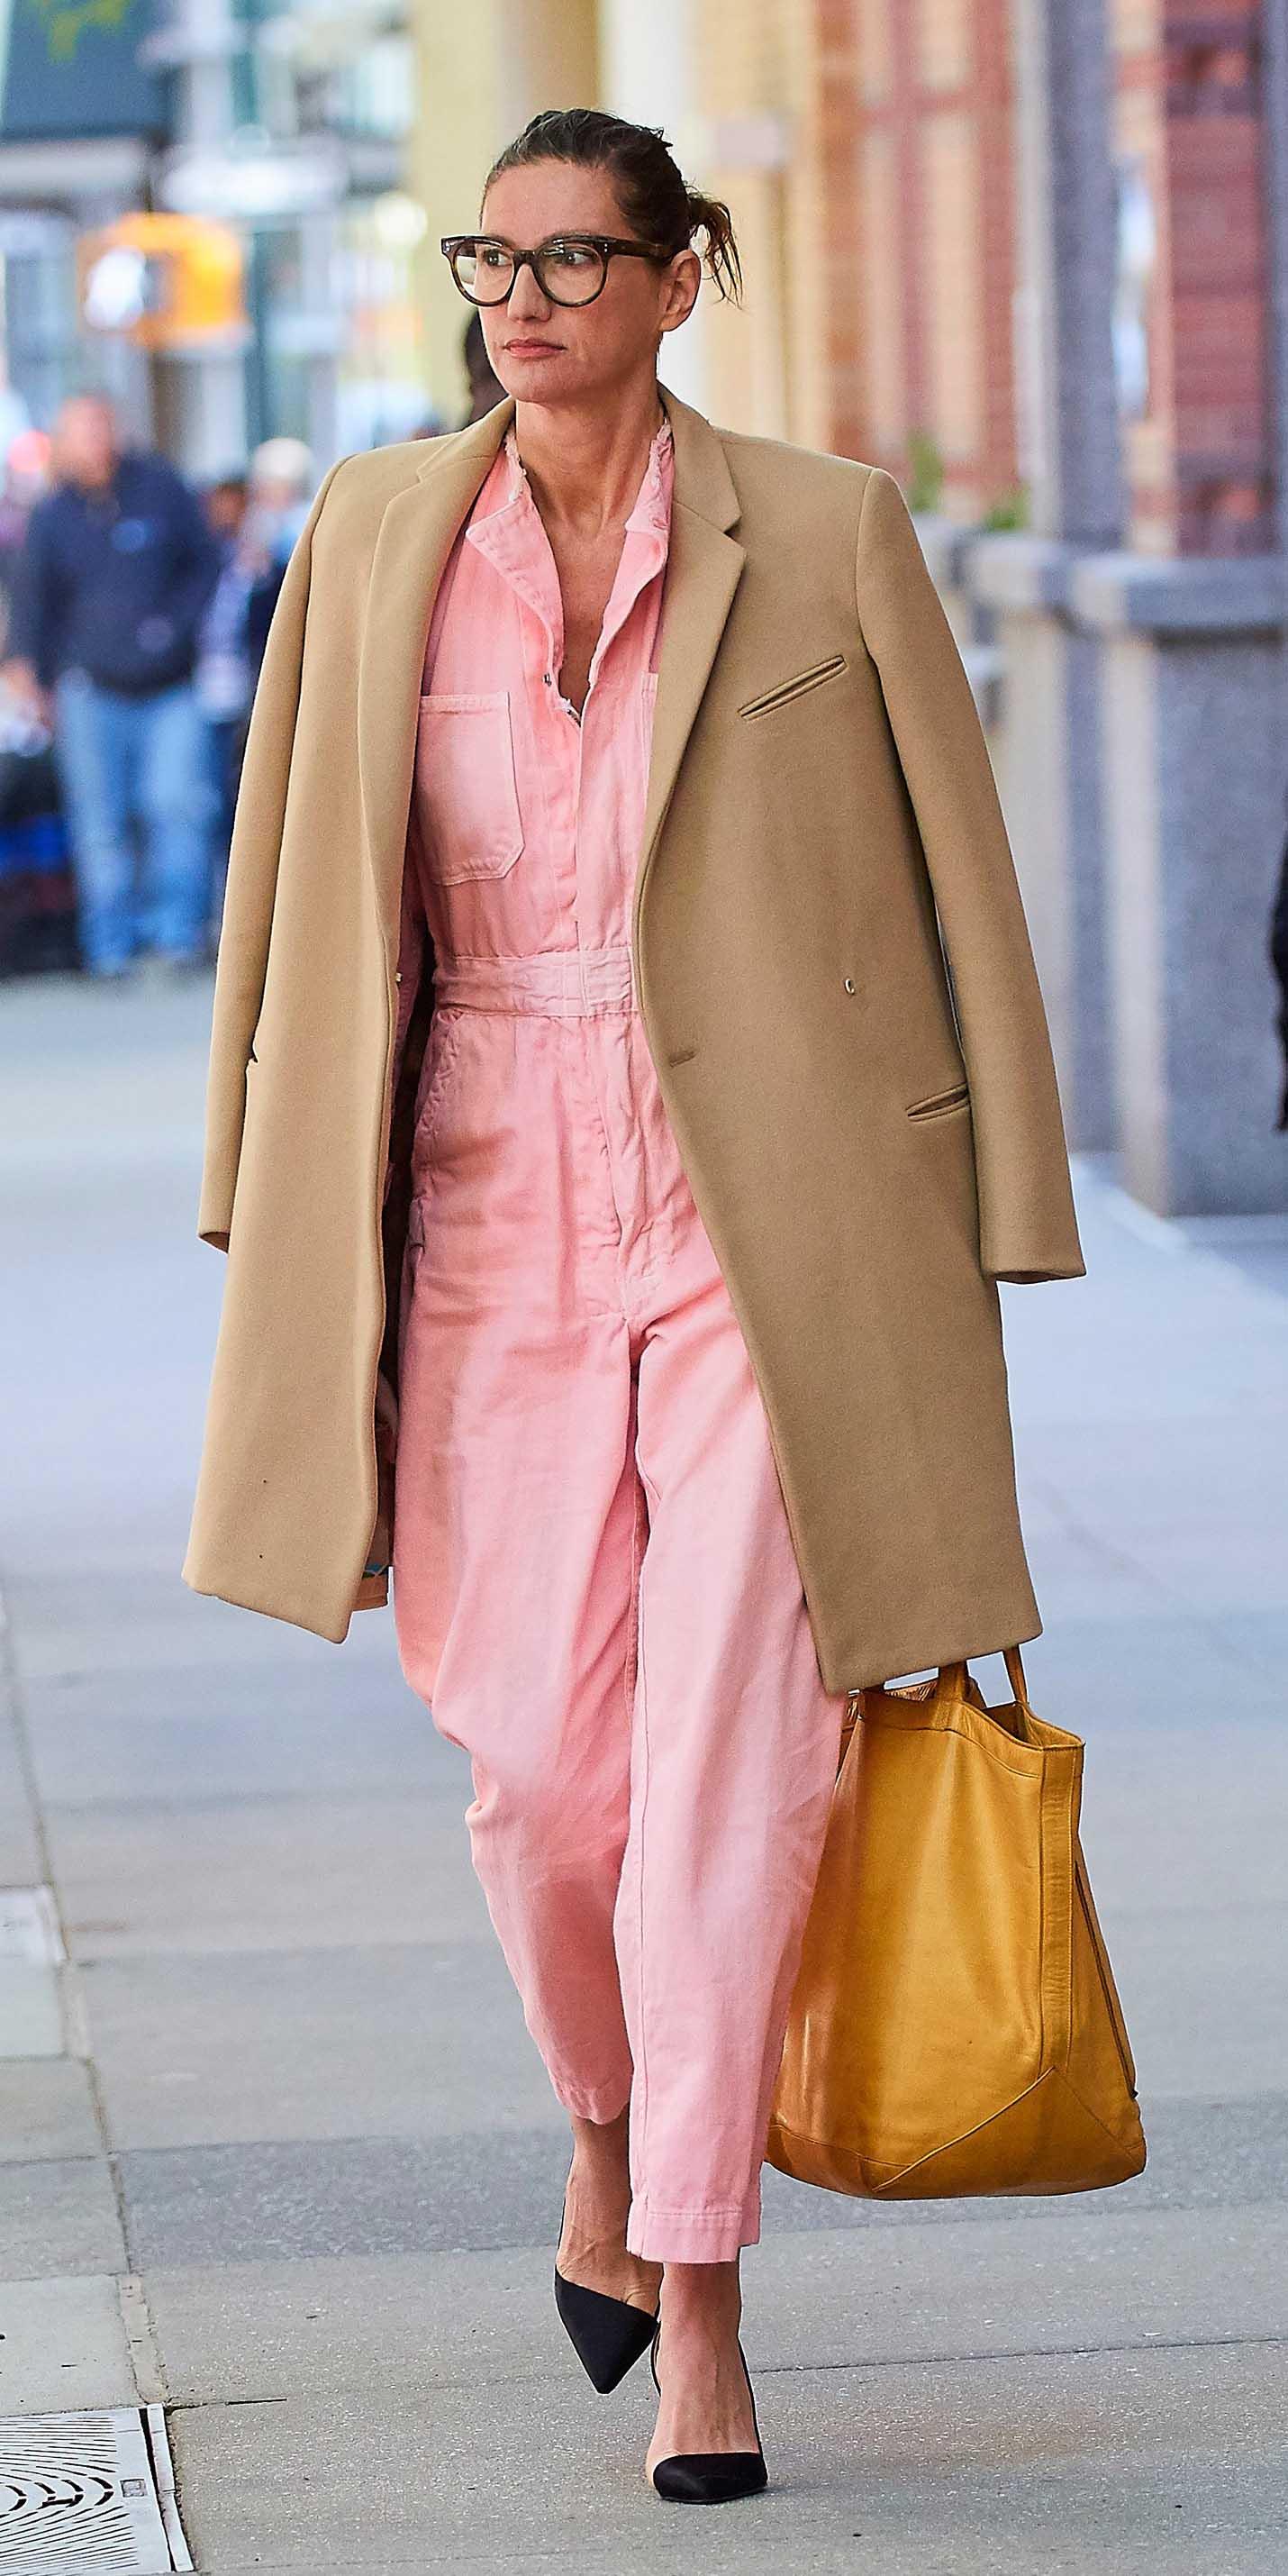 pink-light-jumpsuit-tan-jacket-coat-black-shoe-pumps-jennalyons-howtowear-fall-winter-hairr-work.jpg